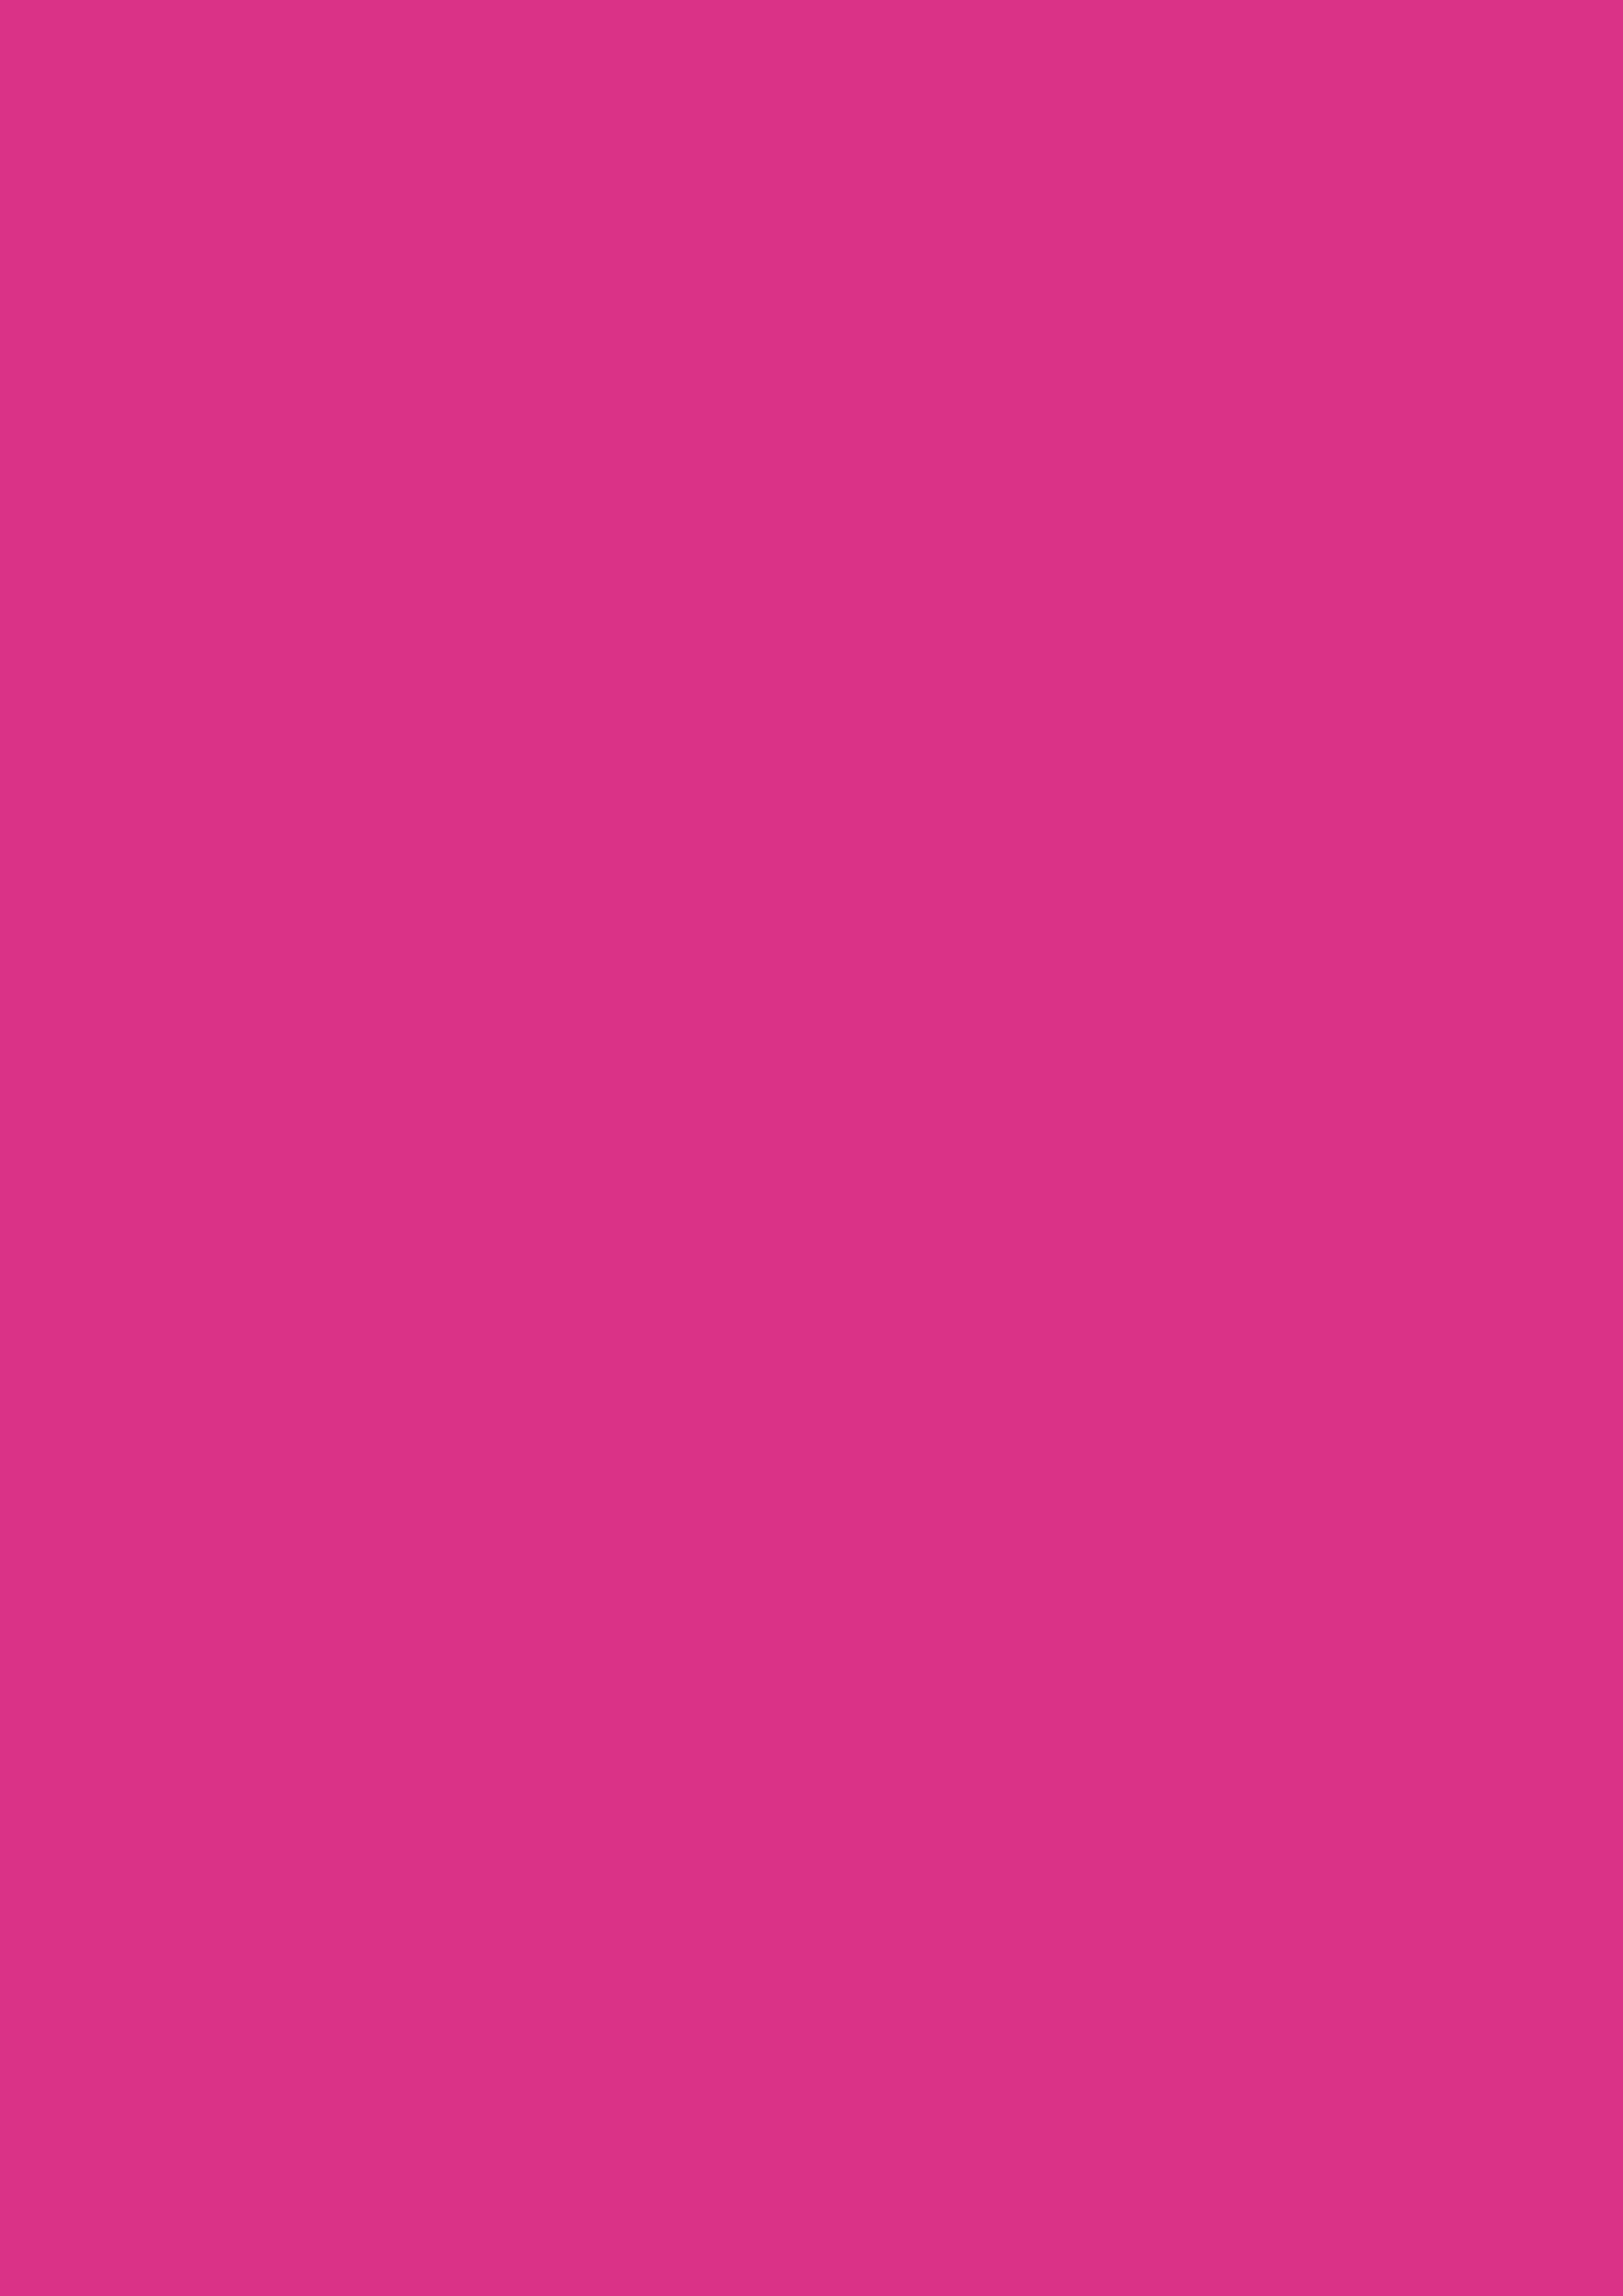 2480x3508 Deep Cerise Solid Color Background